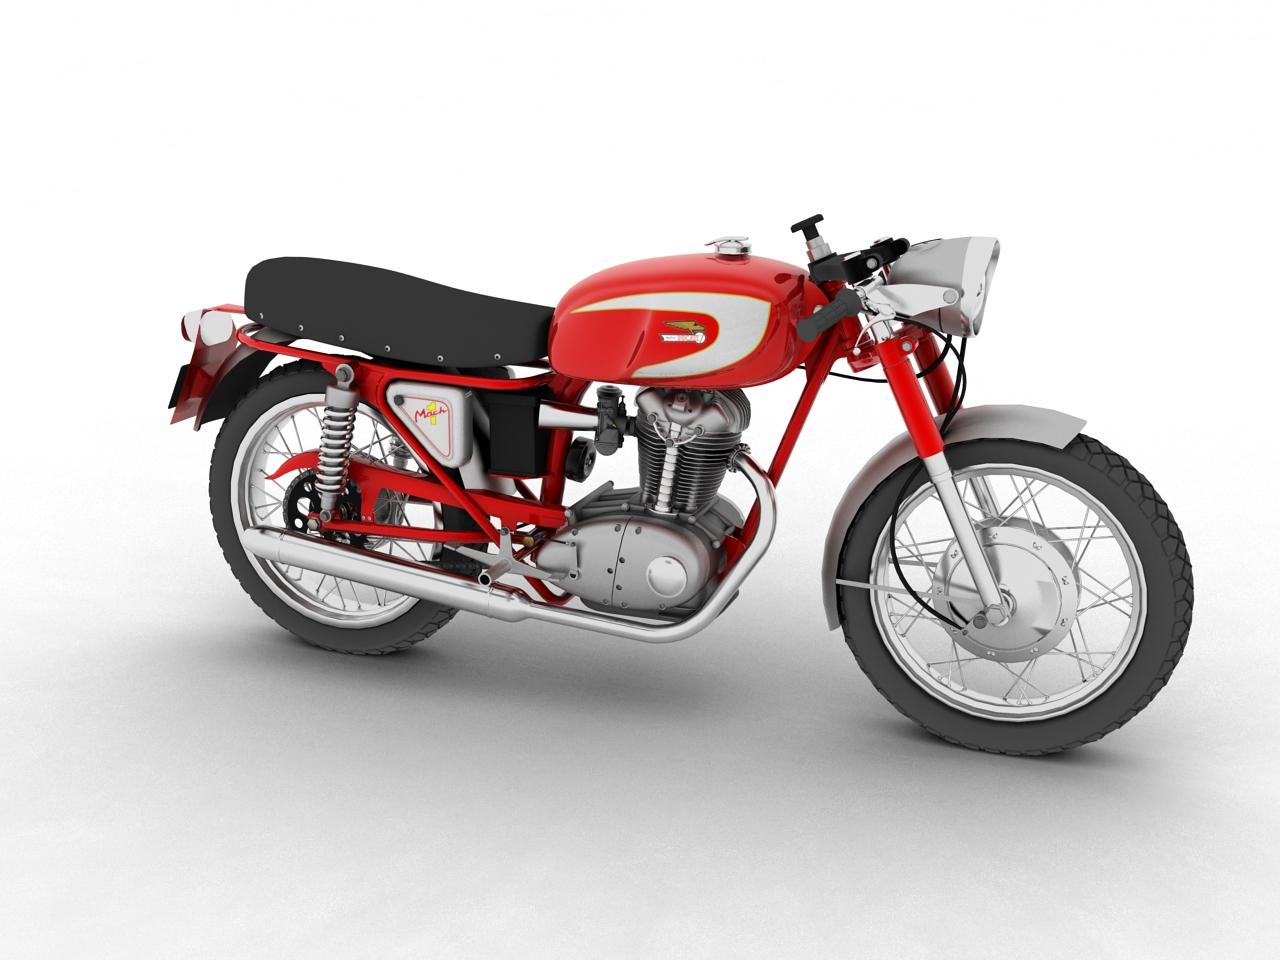 ducati 250 mach 1 1964 samhail 3d 3ds max fbx c4d obj 154923